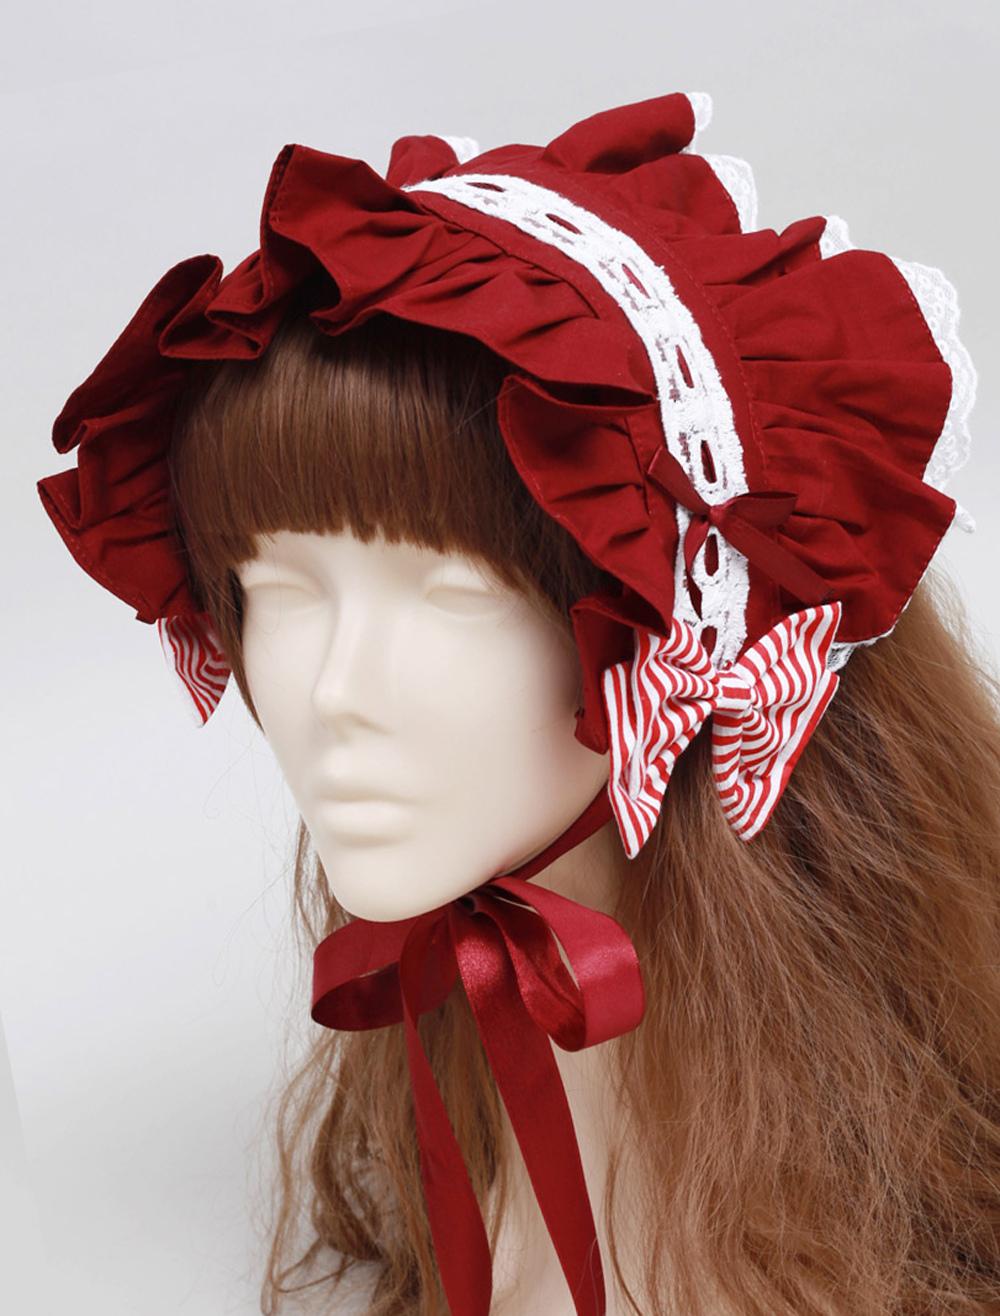 Red Ruffles Cotton Lovely Lolita Headdress